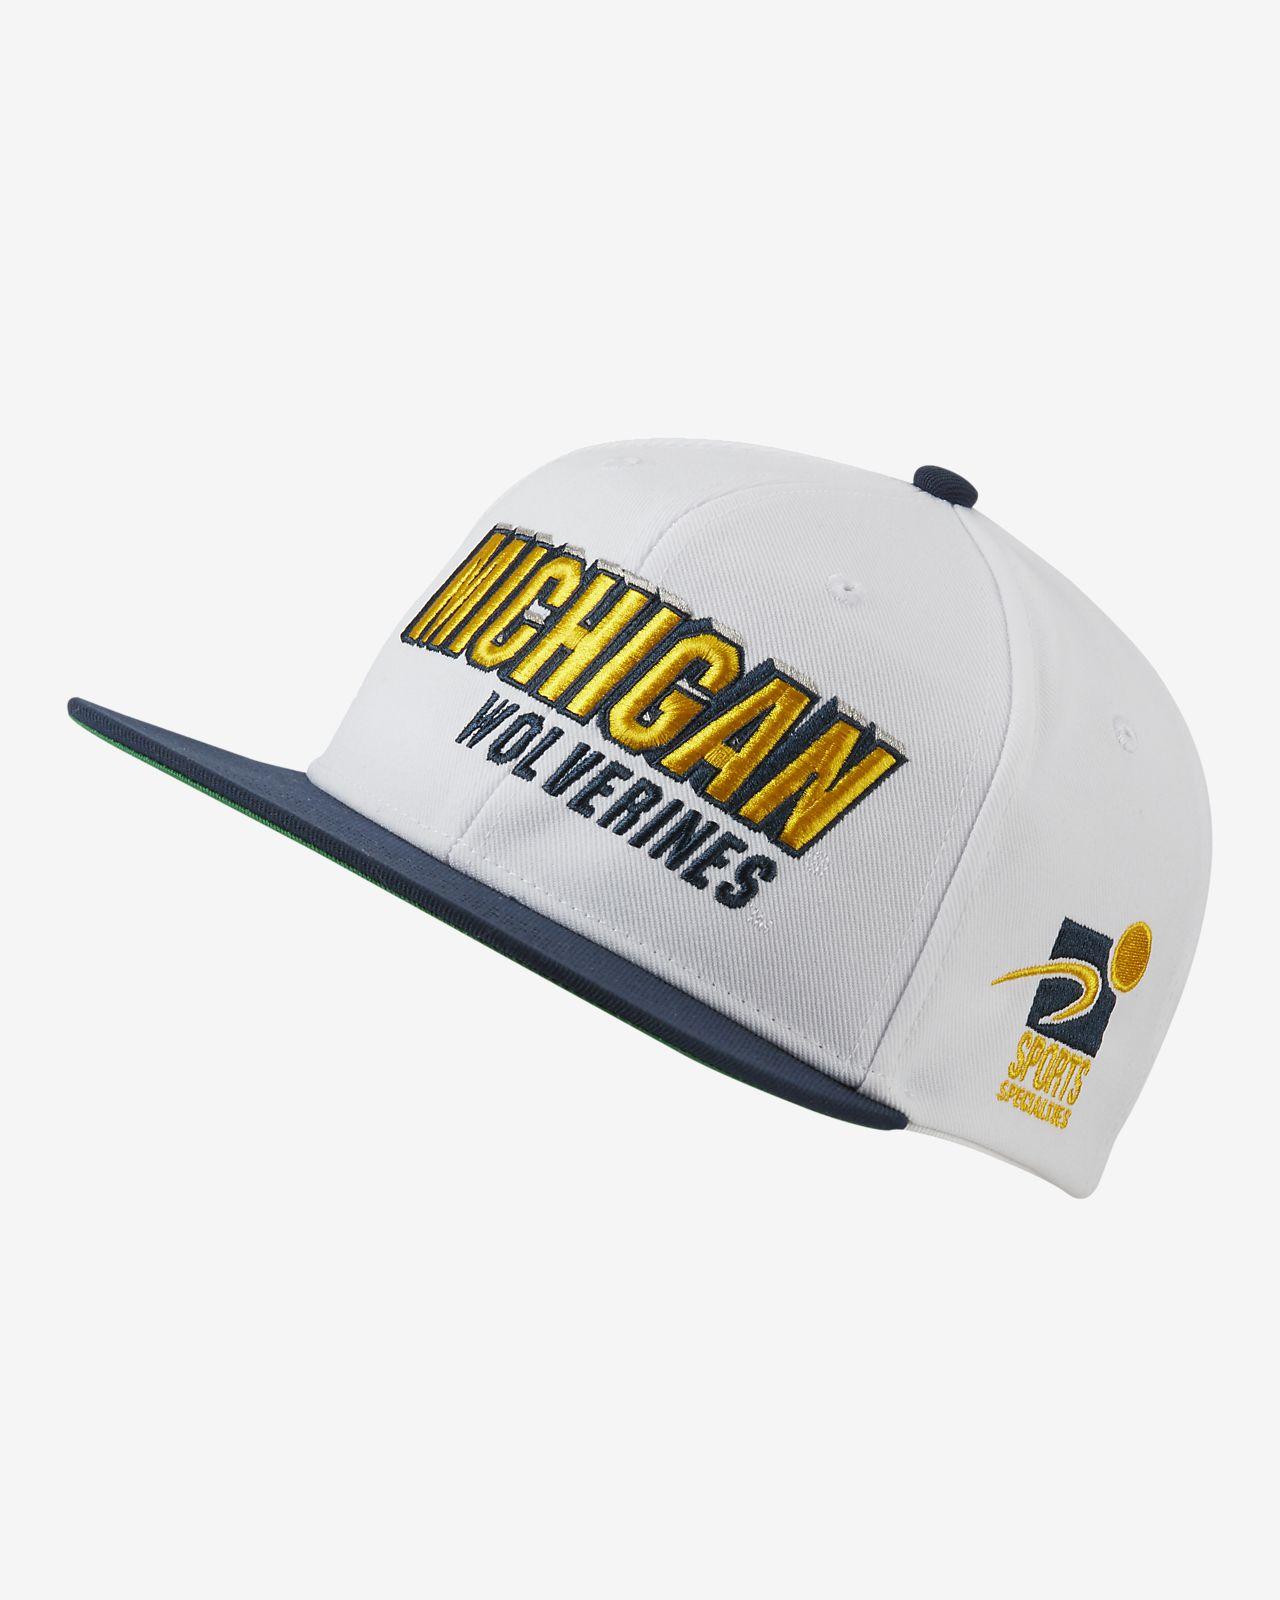 Nike Pro Sports Specialties (Michigan) Adjustable Hat